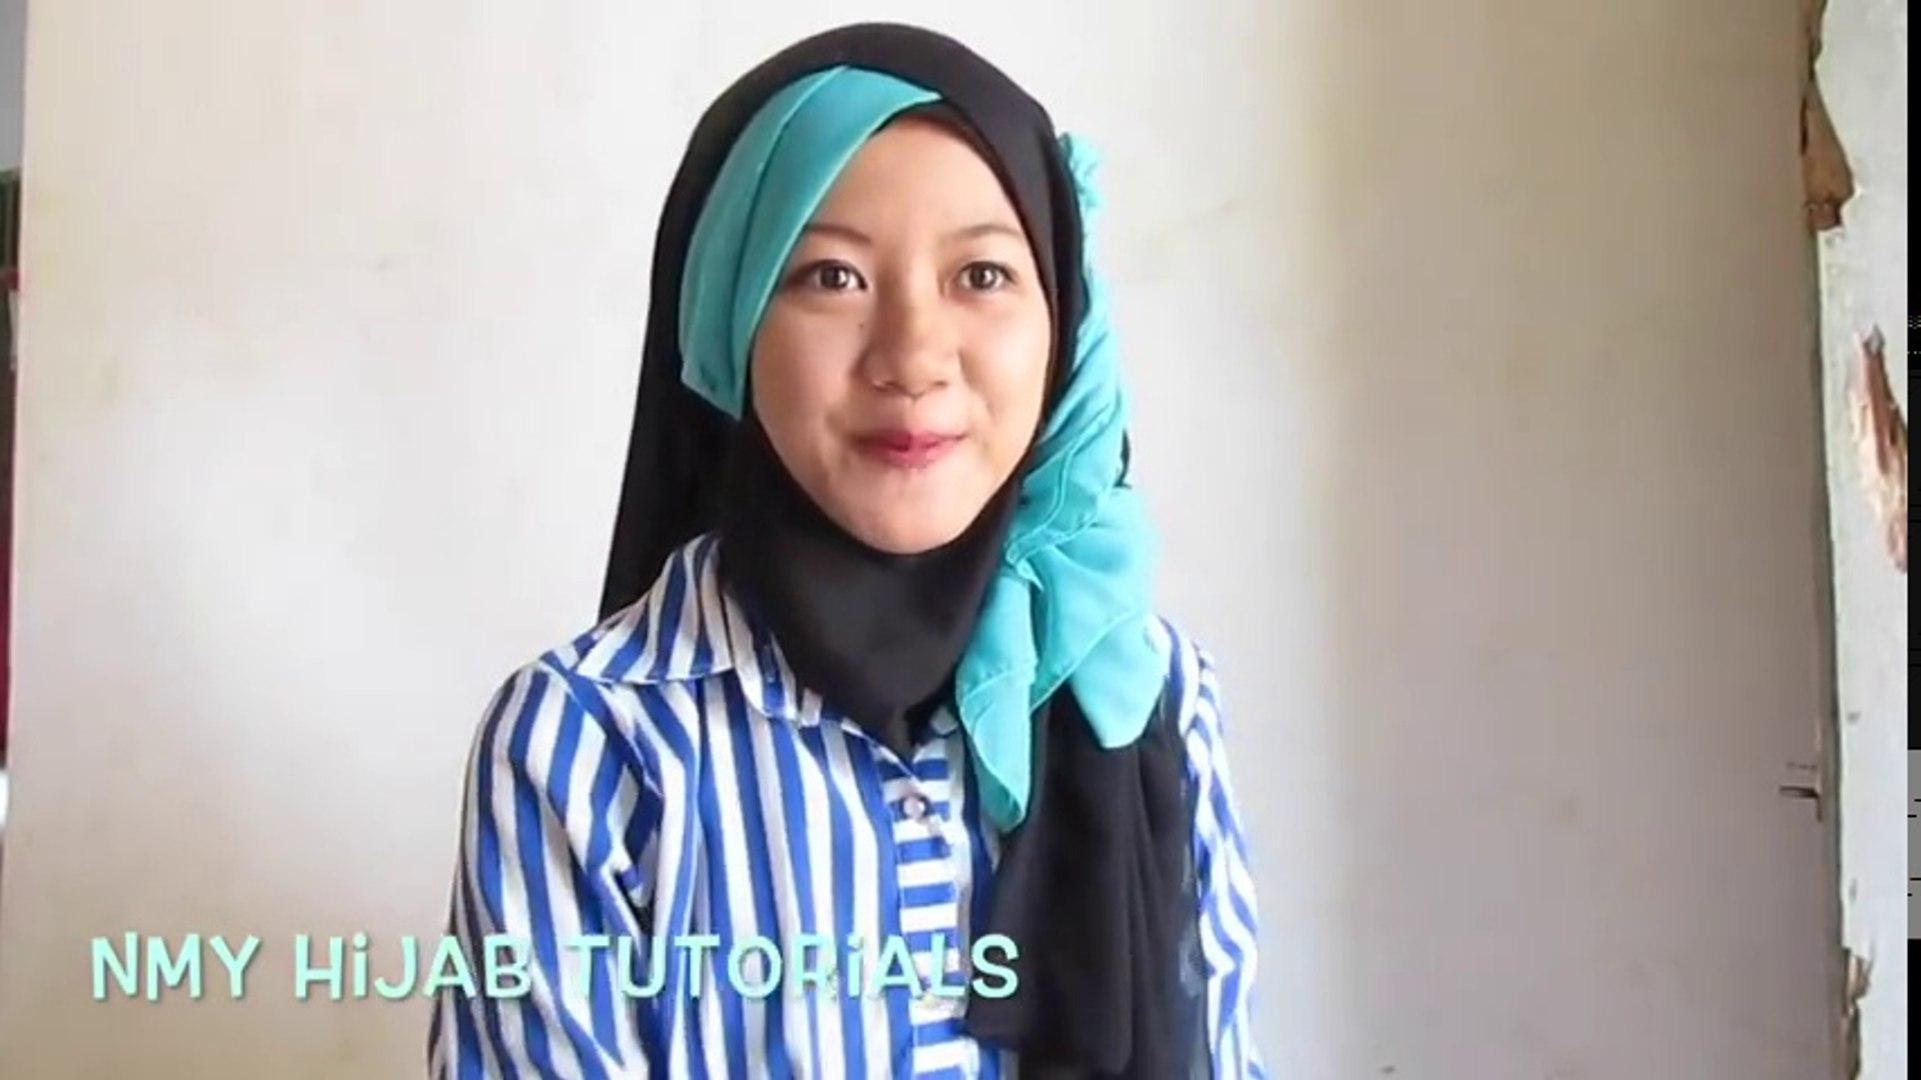 Tutorial Hijab Segi Empat Paris 2 Warna Untuk Pesta Kondangan Simple By Nmy Hijab Tutorials Video Dailymotion